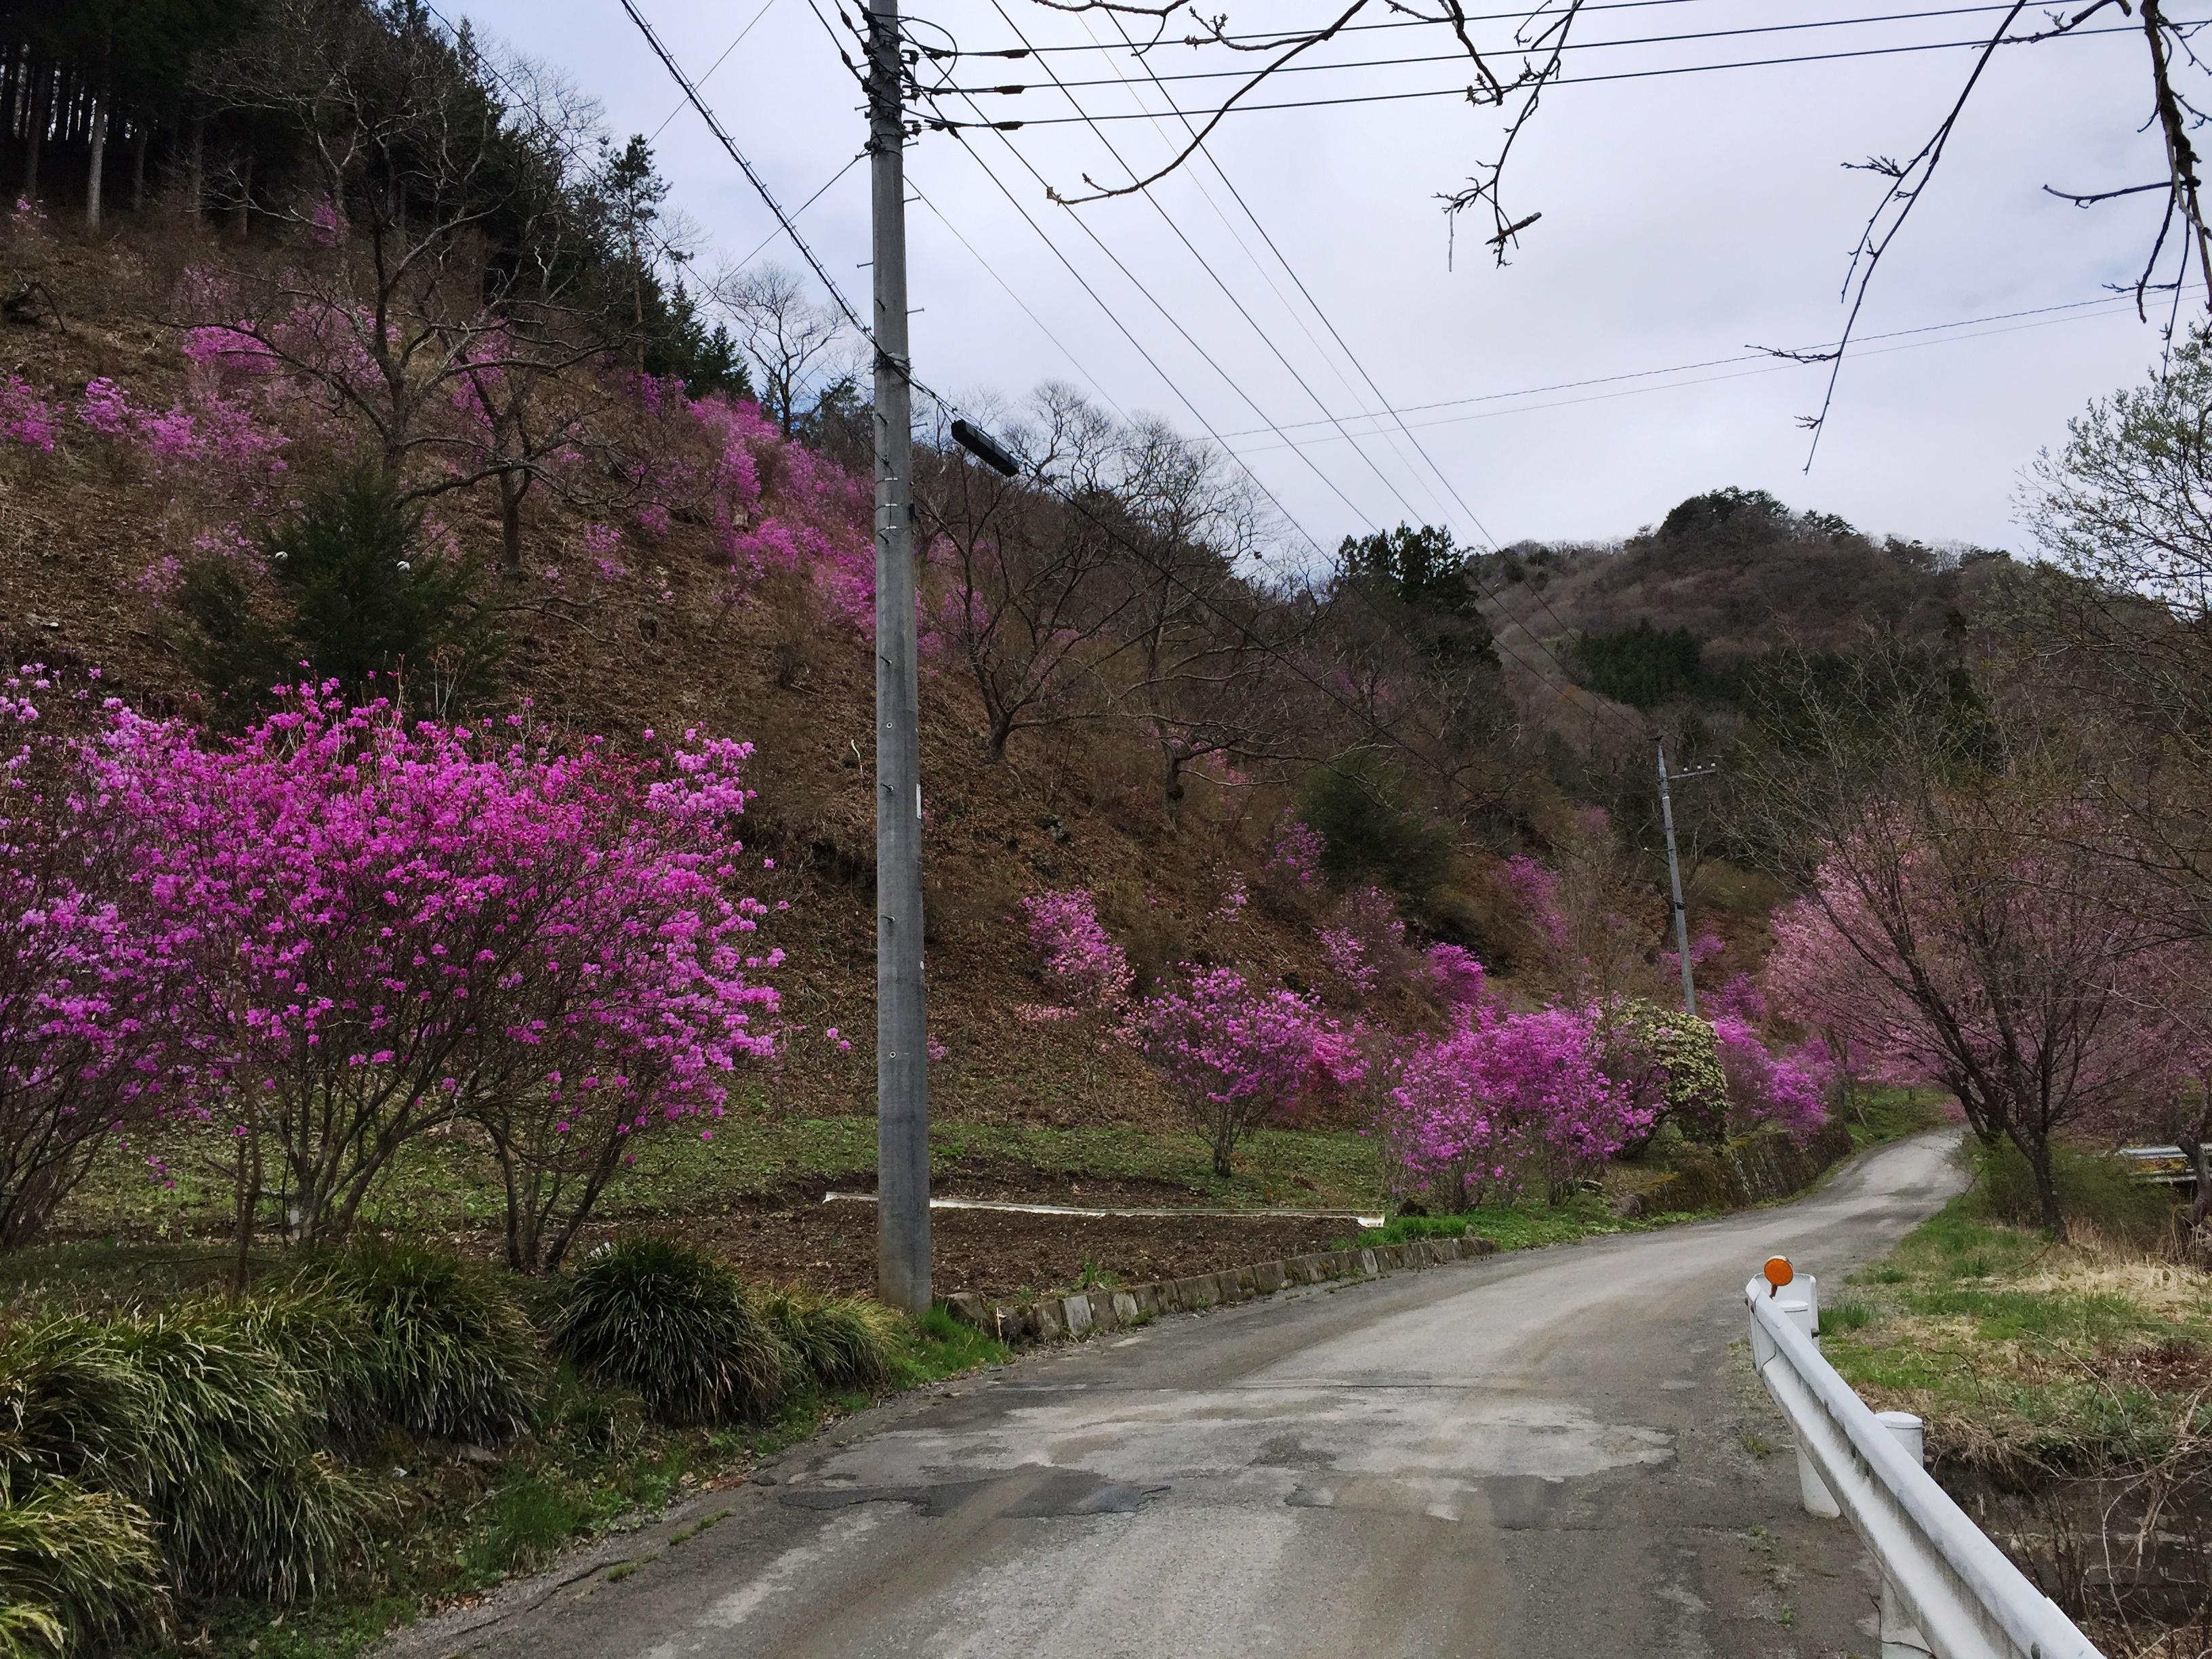 http://www.uenomura.ne.jp/blog/photonews2/20150421_010911273_iOS-s.jpg